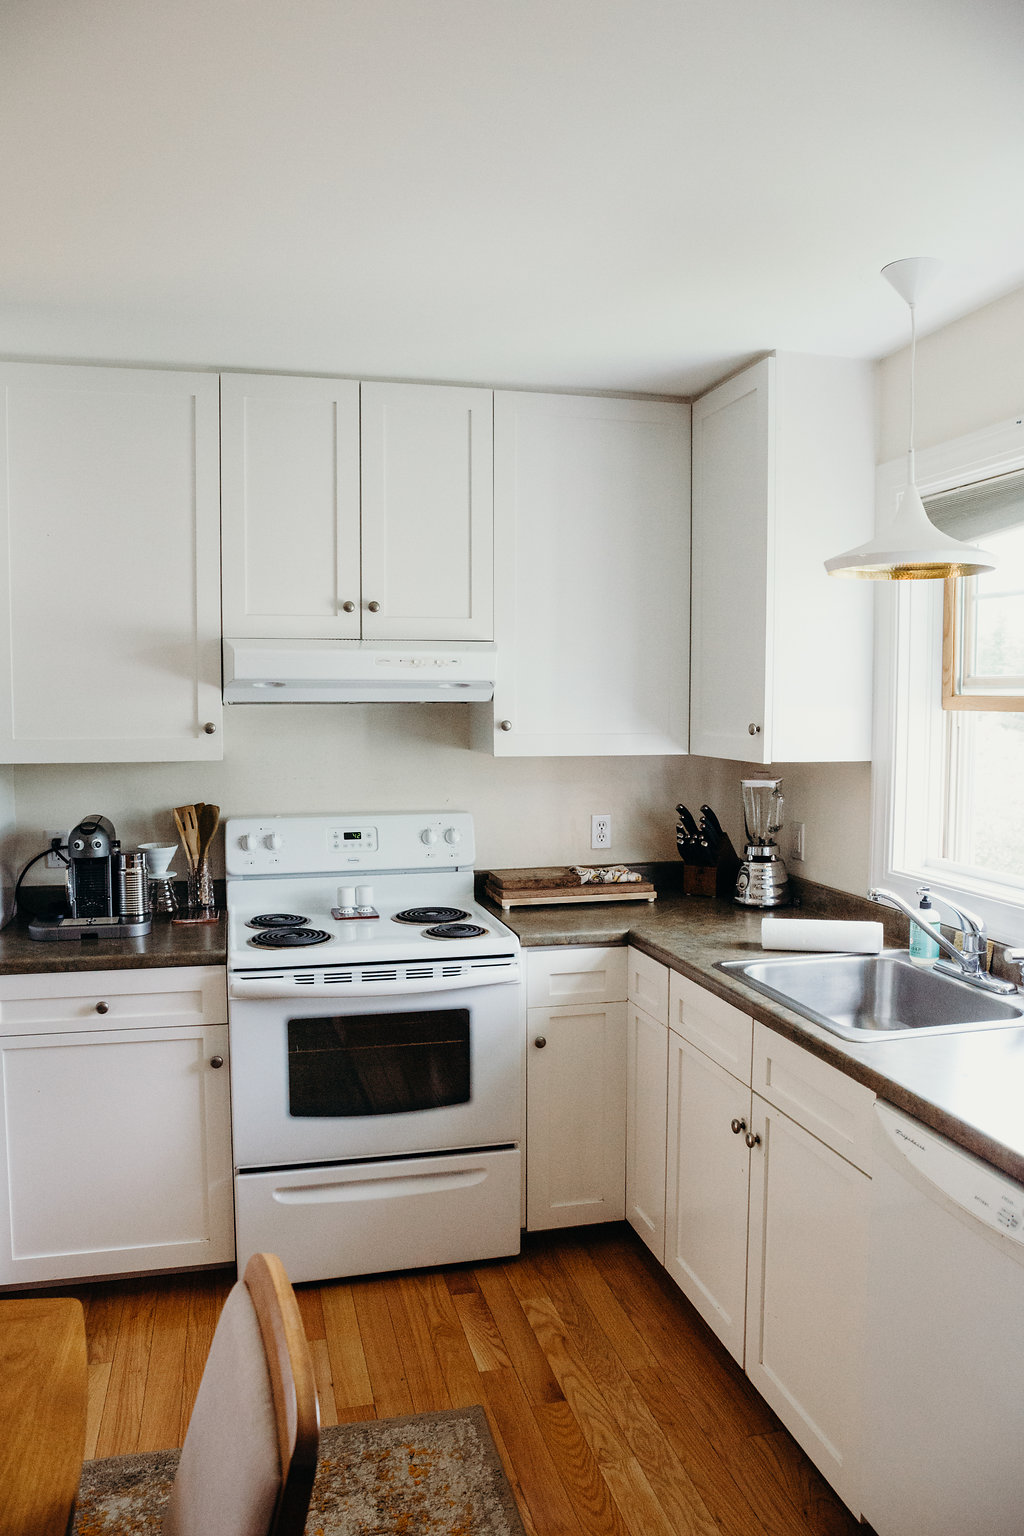 The Love Nest Kitchen